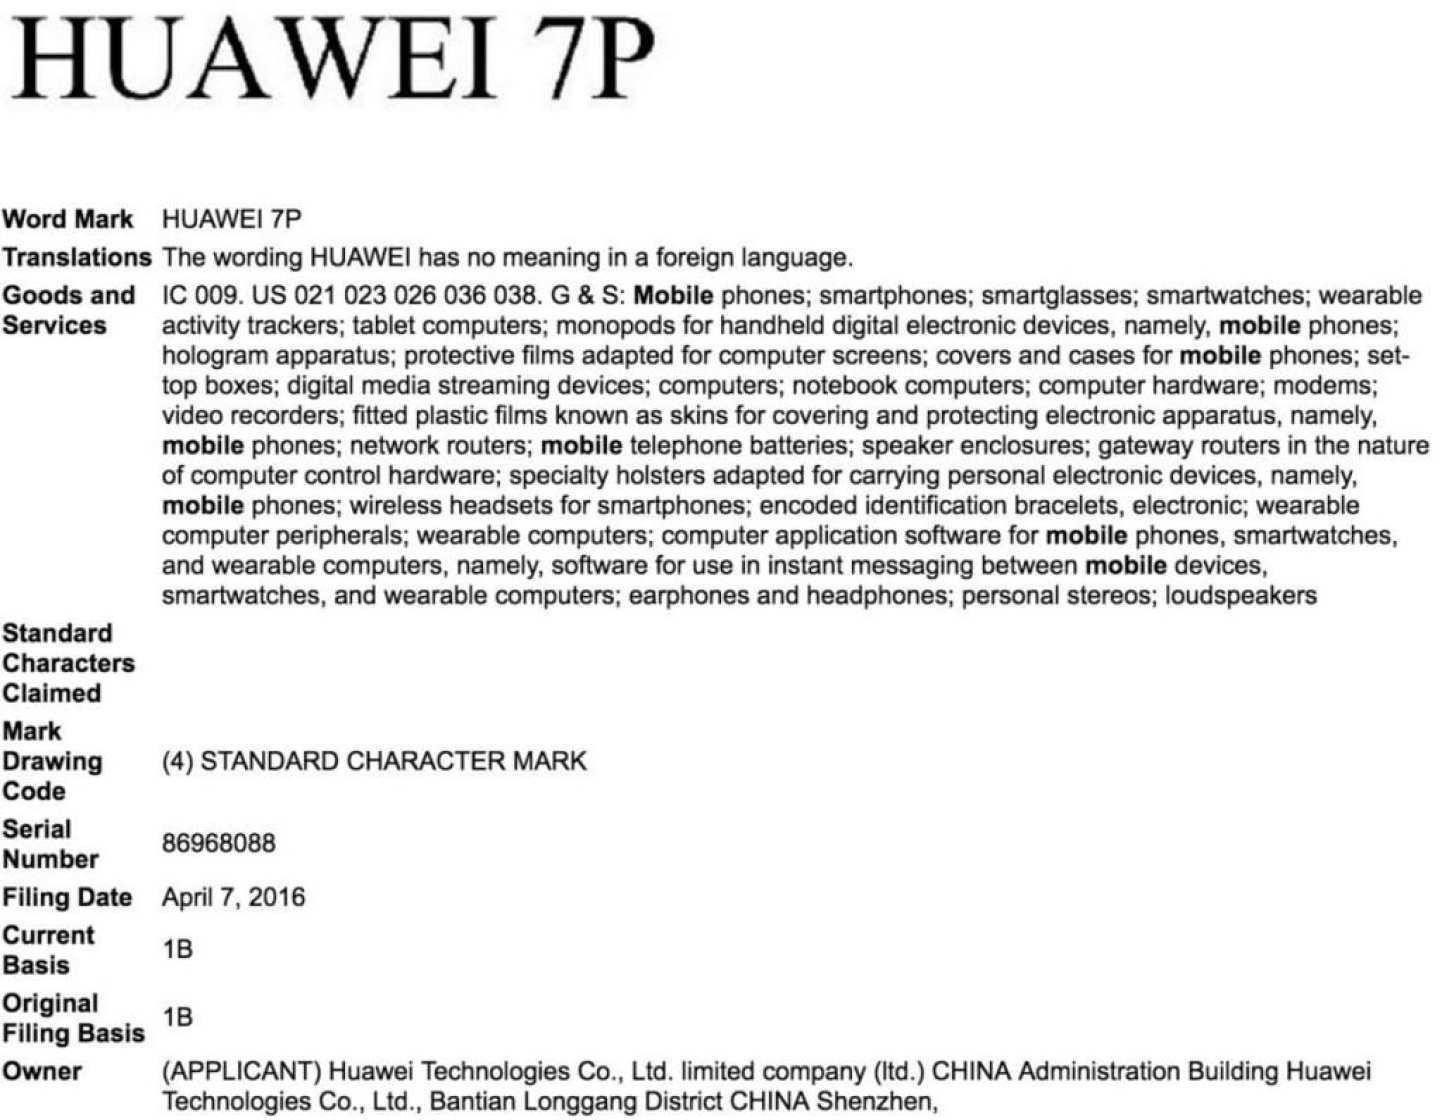 huawei-7p-trademark